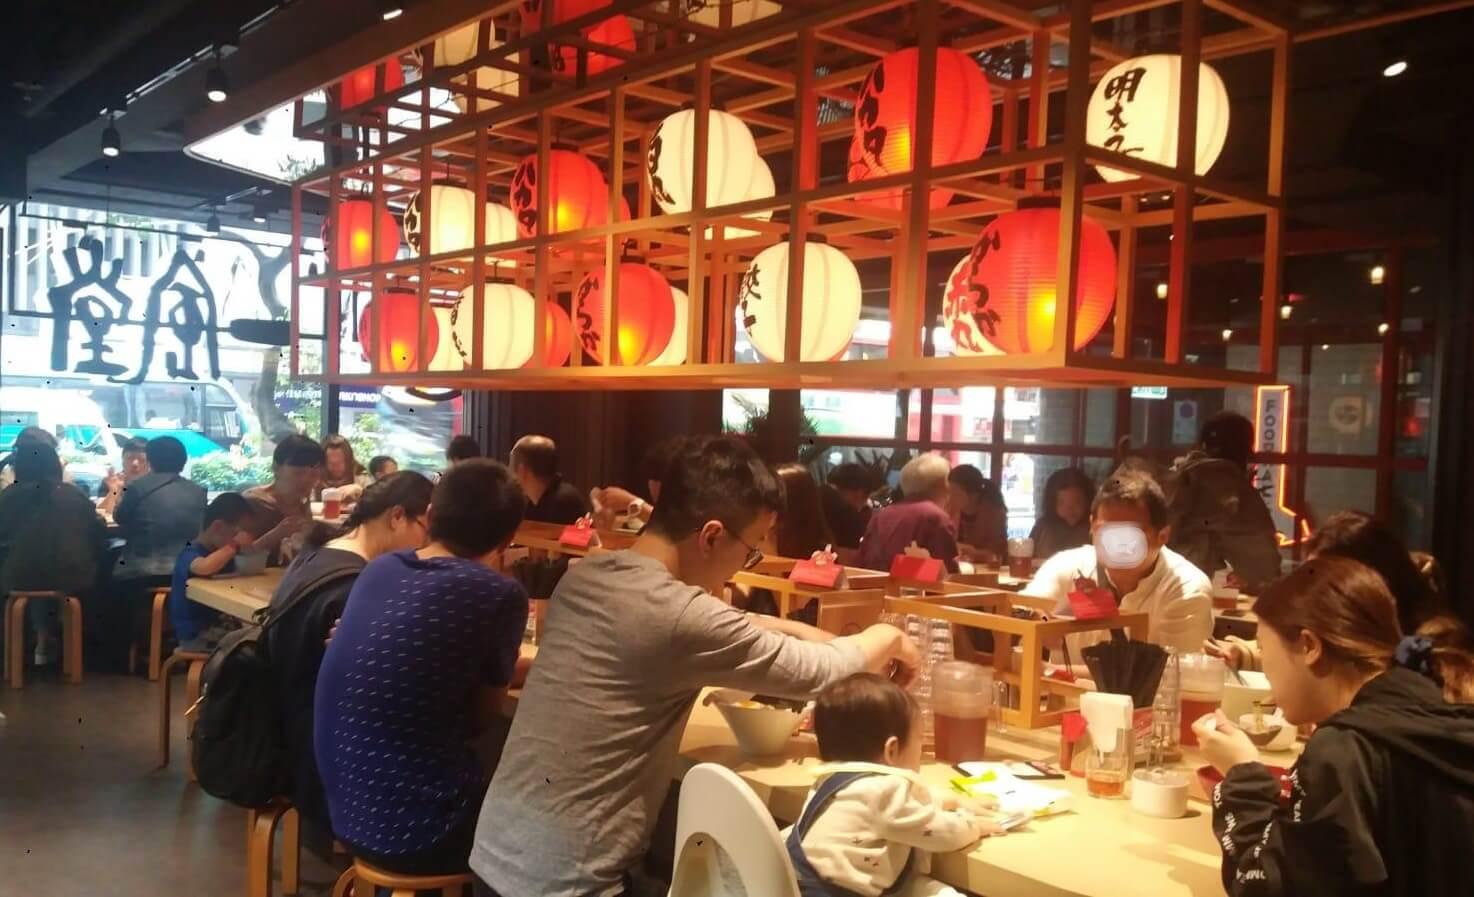 IPPUDO HK Eaton Hotel店 一風堂 ippudo 香港 hong kong sub1